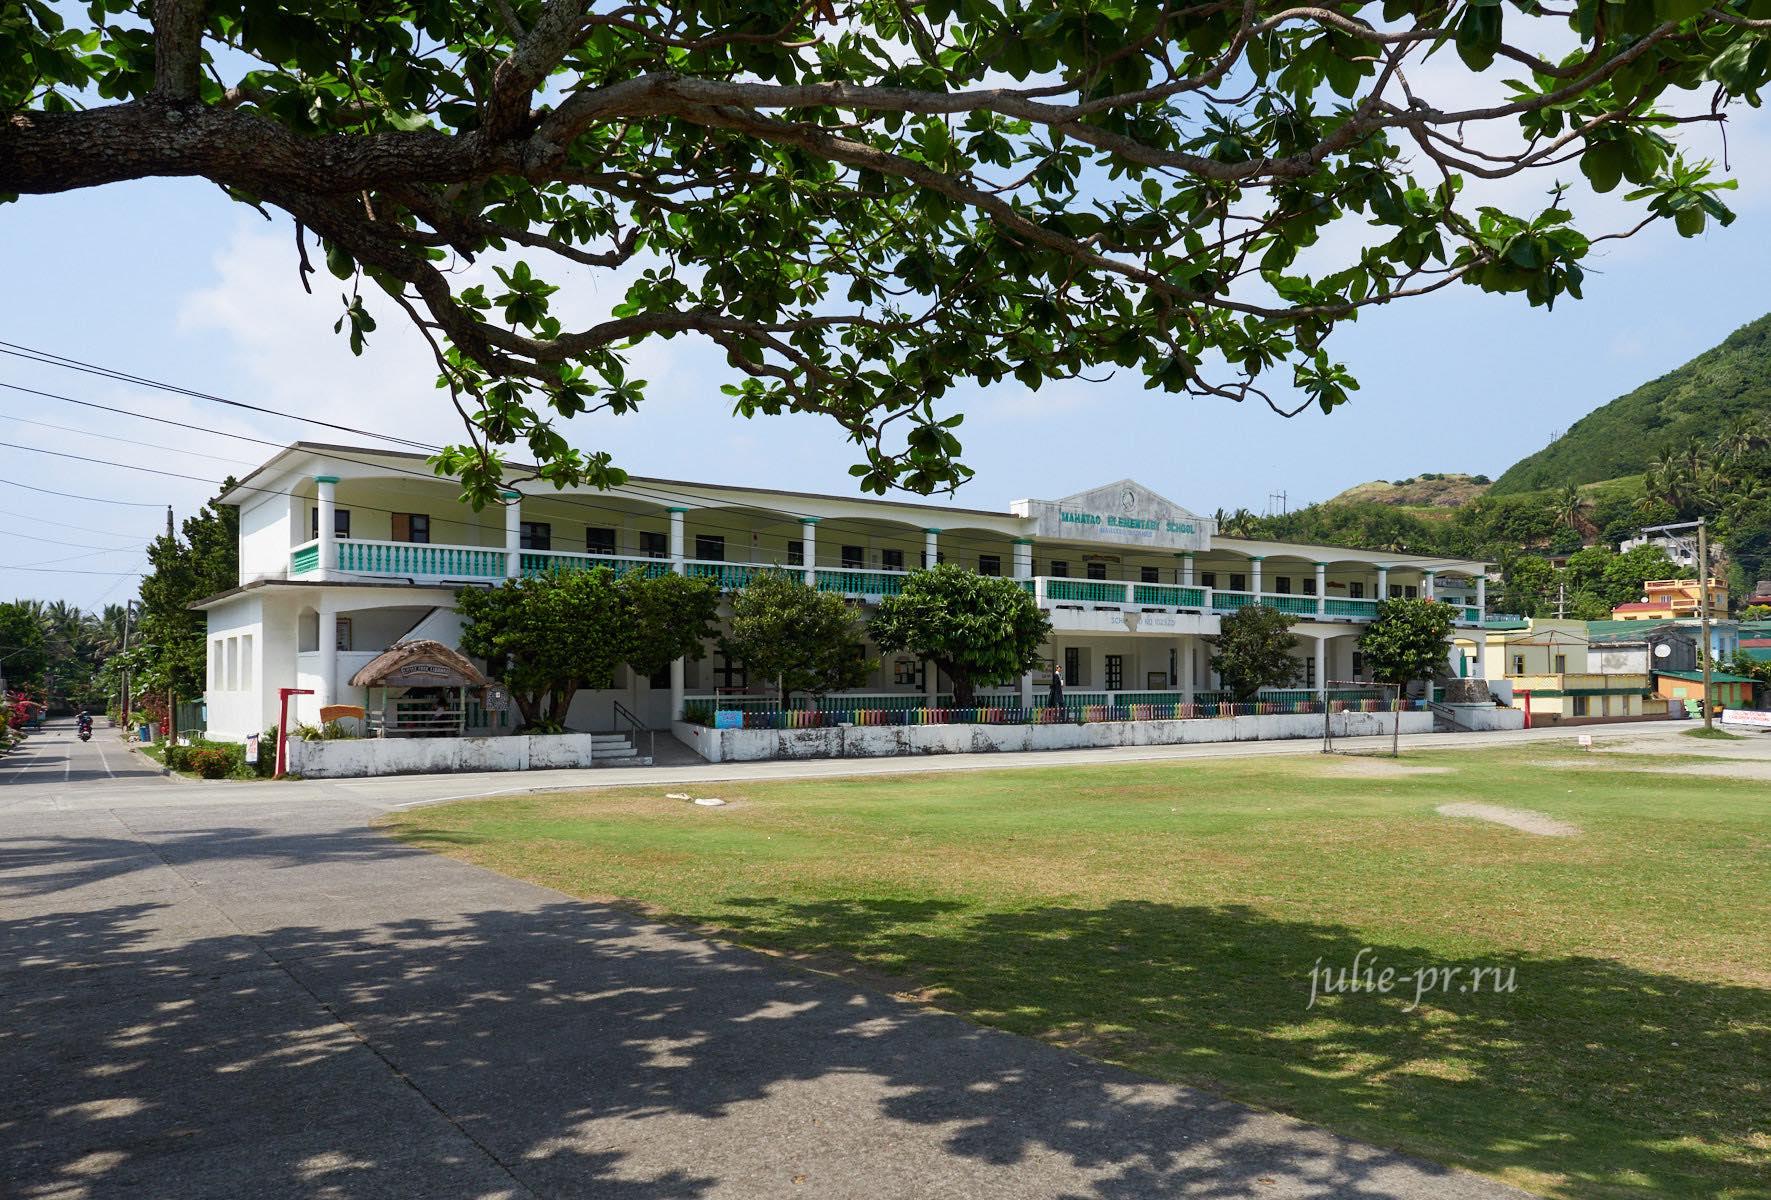 Филиппины, острова Батанес, школа, Mahatao